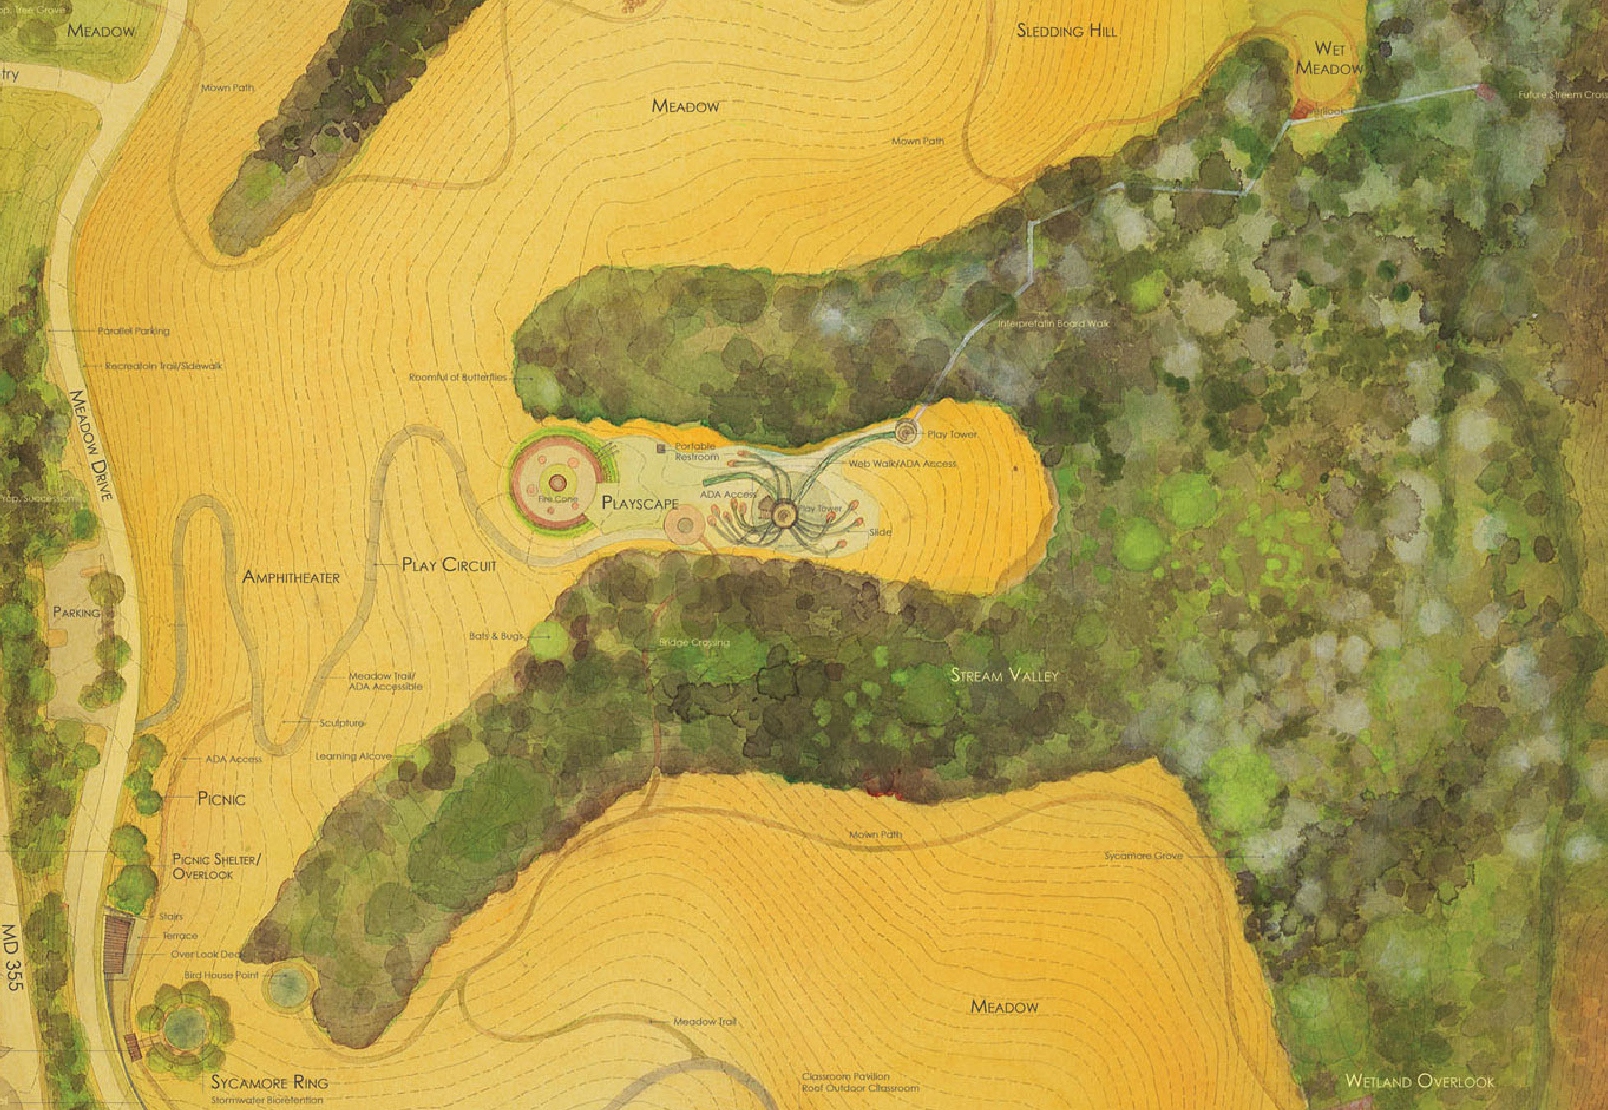 055-Site Plan-1.jpg